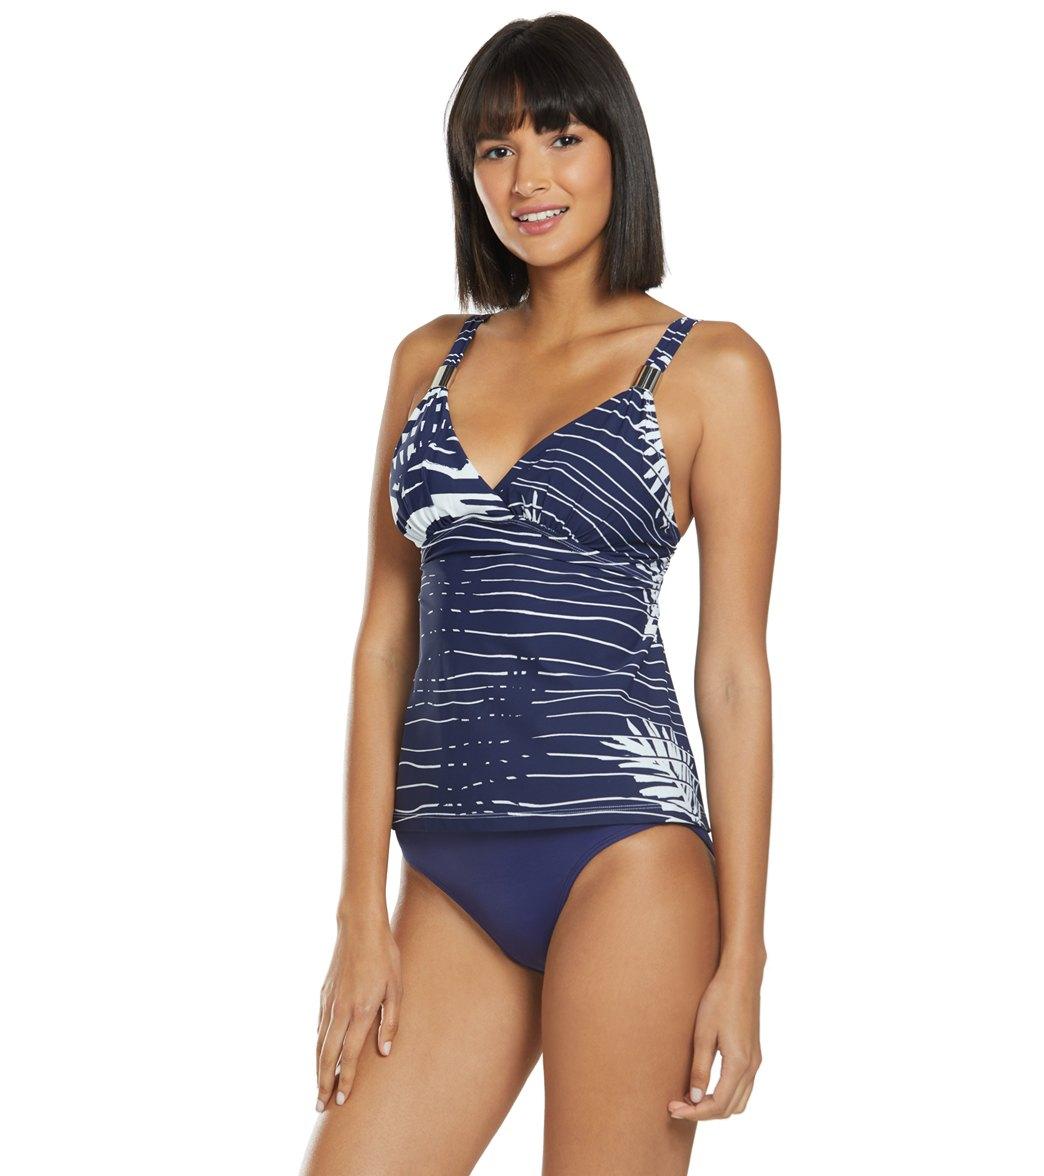 948958974e539 Amoressa Venetian Affair Lido Surplice Tankini Top at SwimOutlet.com ...